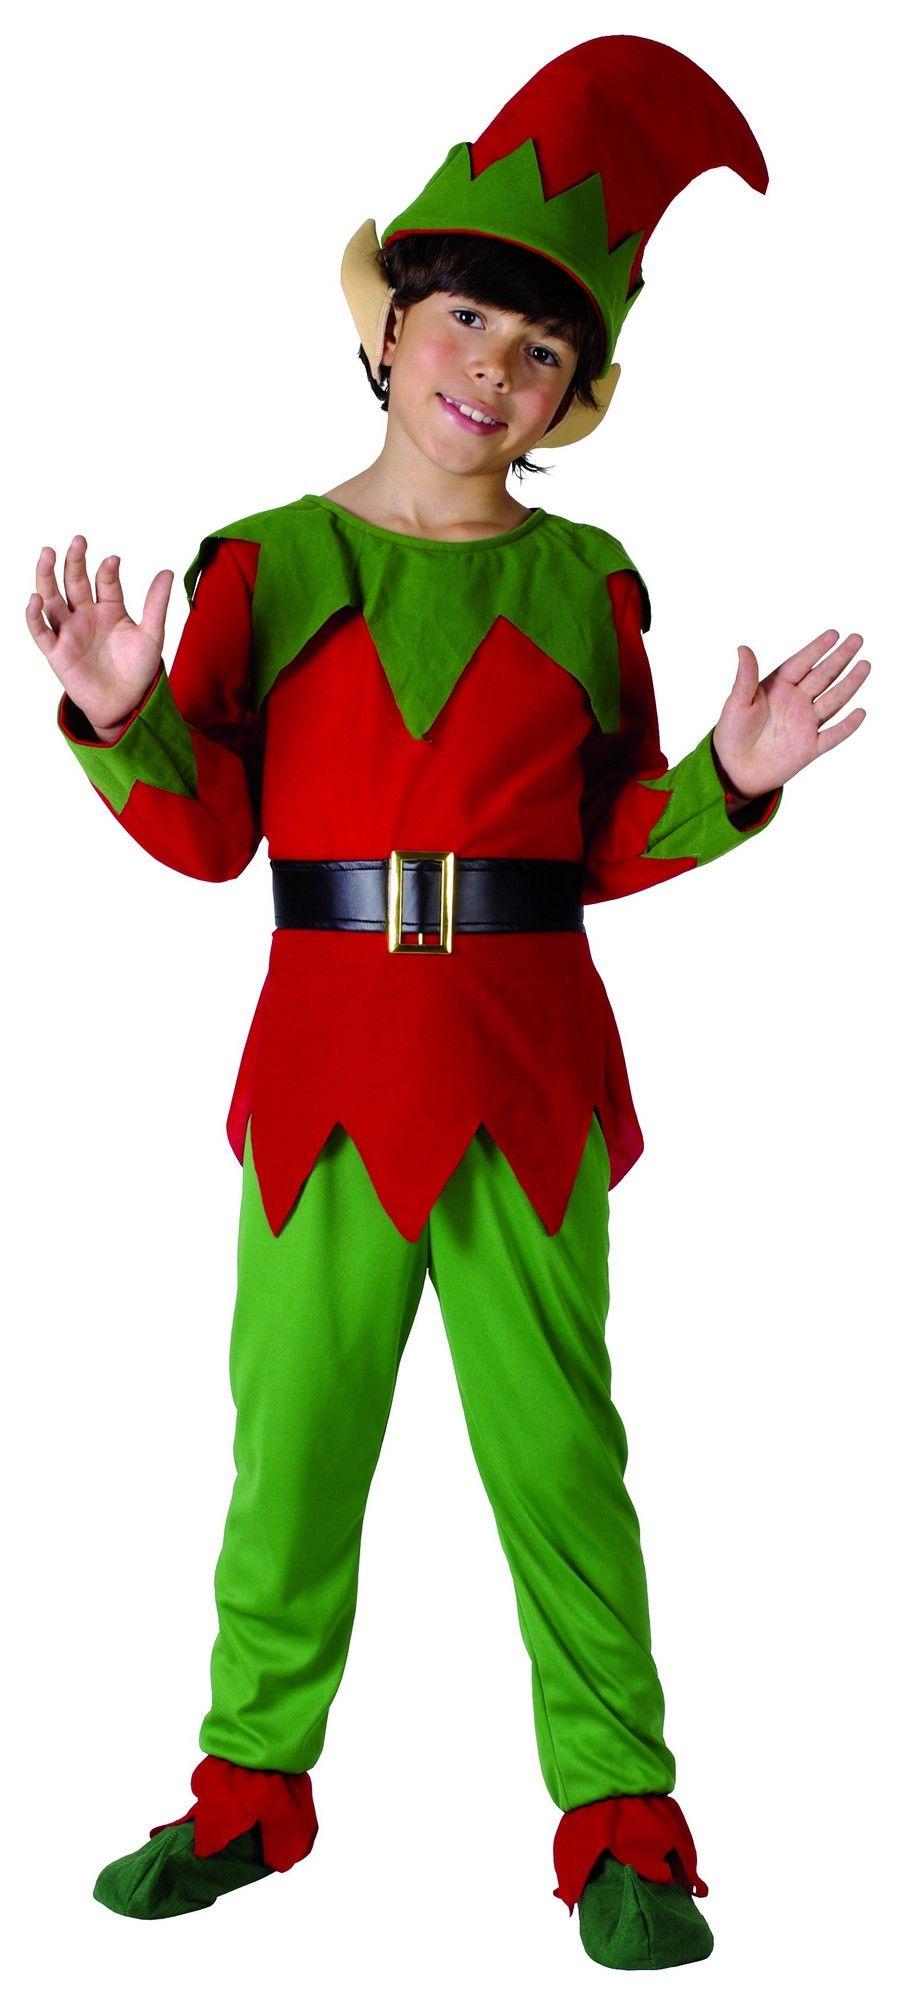 097fea5c0f08 Costume elfo bambino | arte per bimbi | Elfo di natale, Vestiti ...